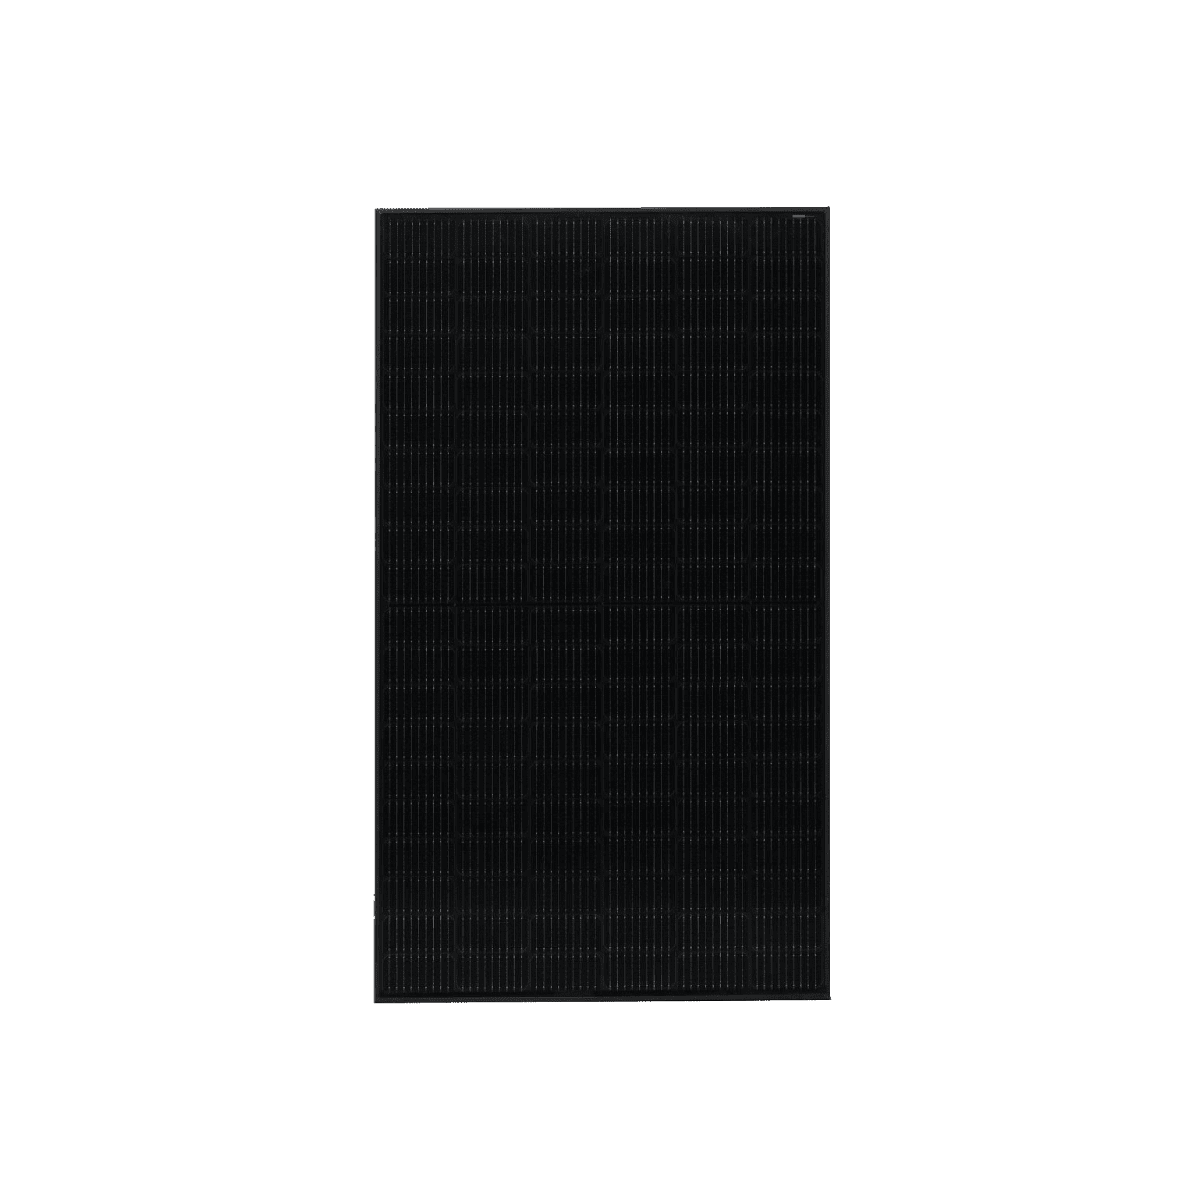 LG Electronics NeON H All Black 370W solar panel